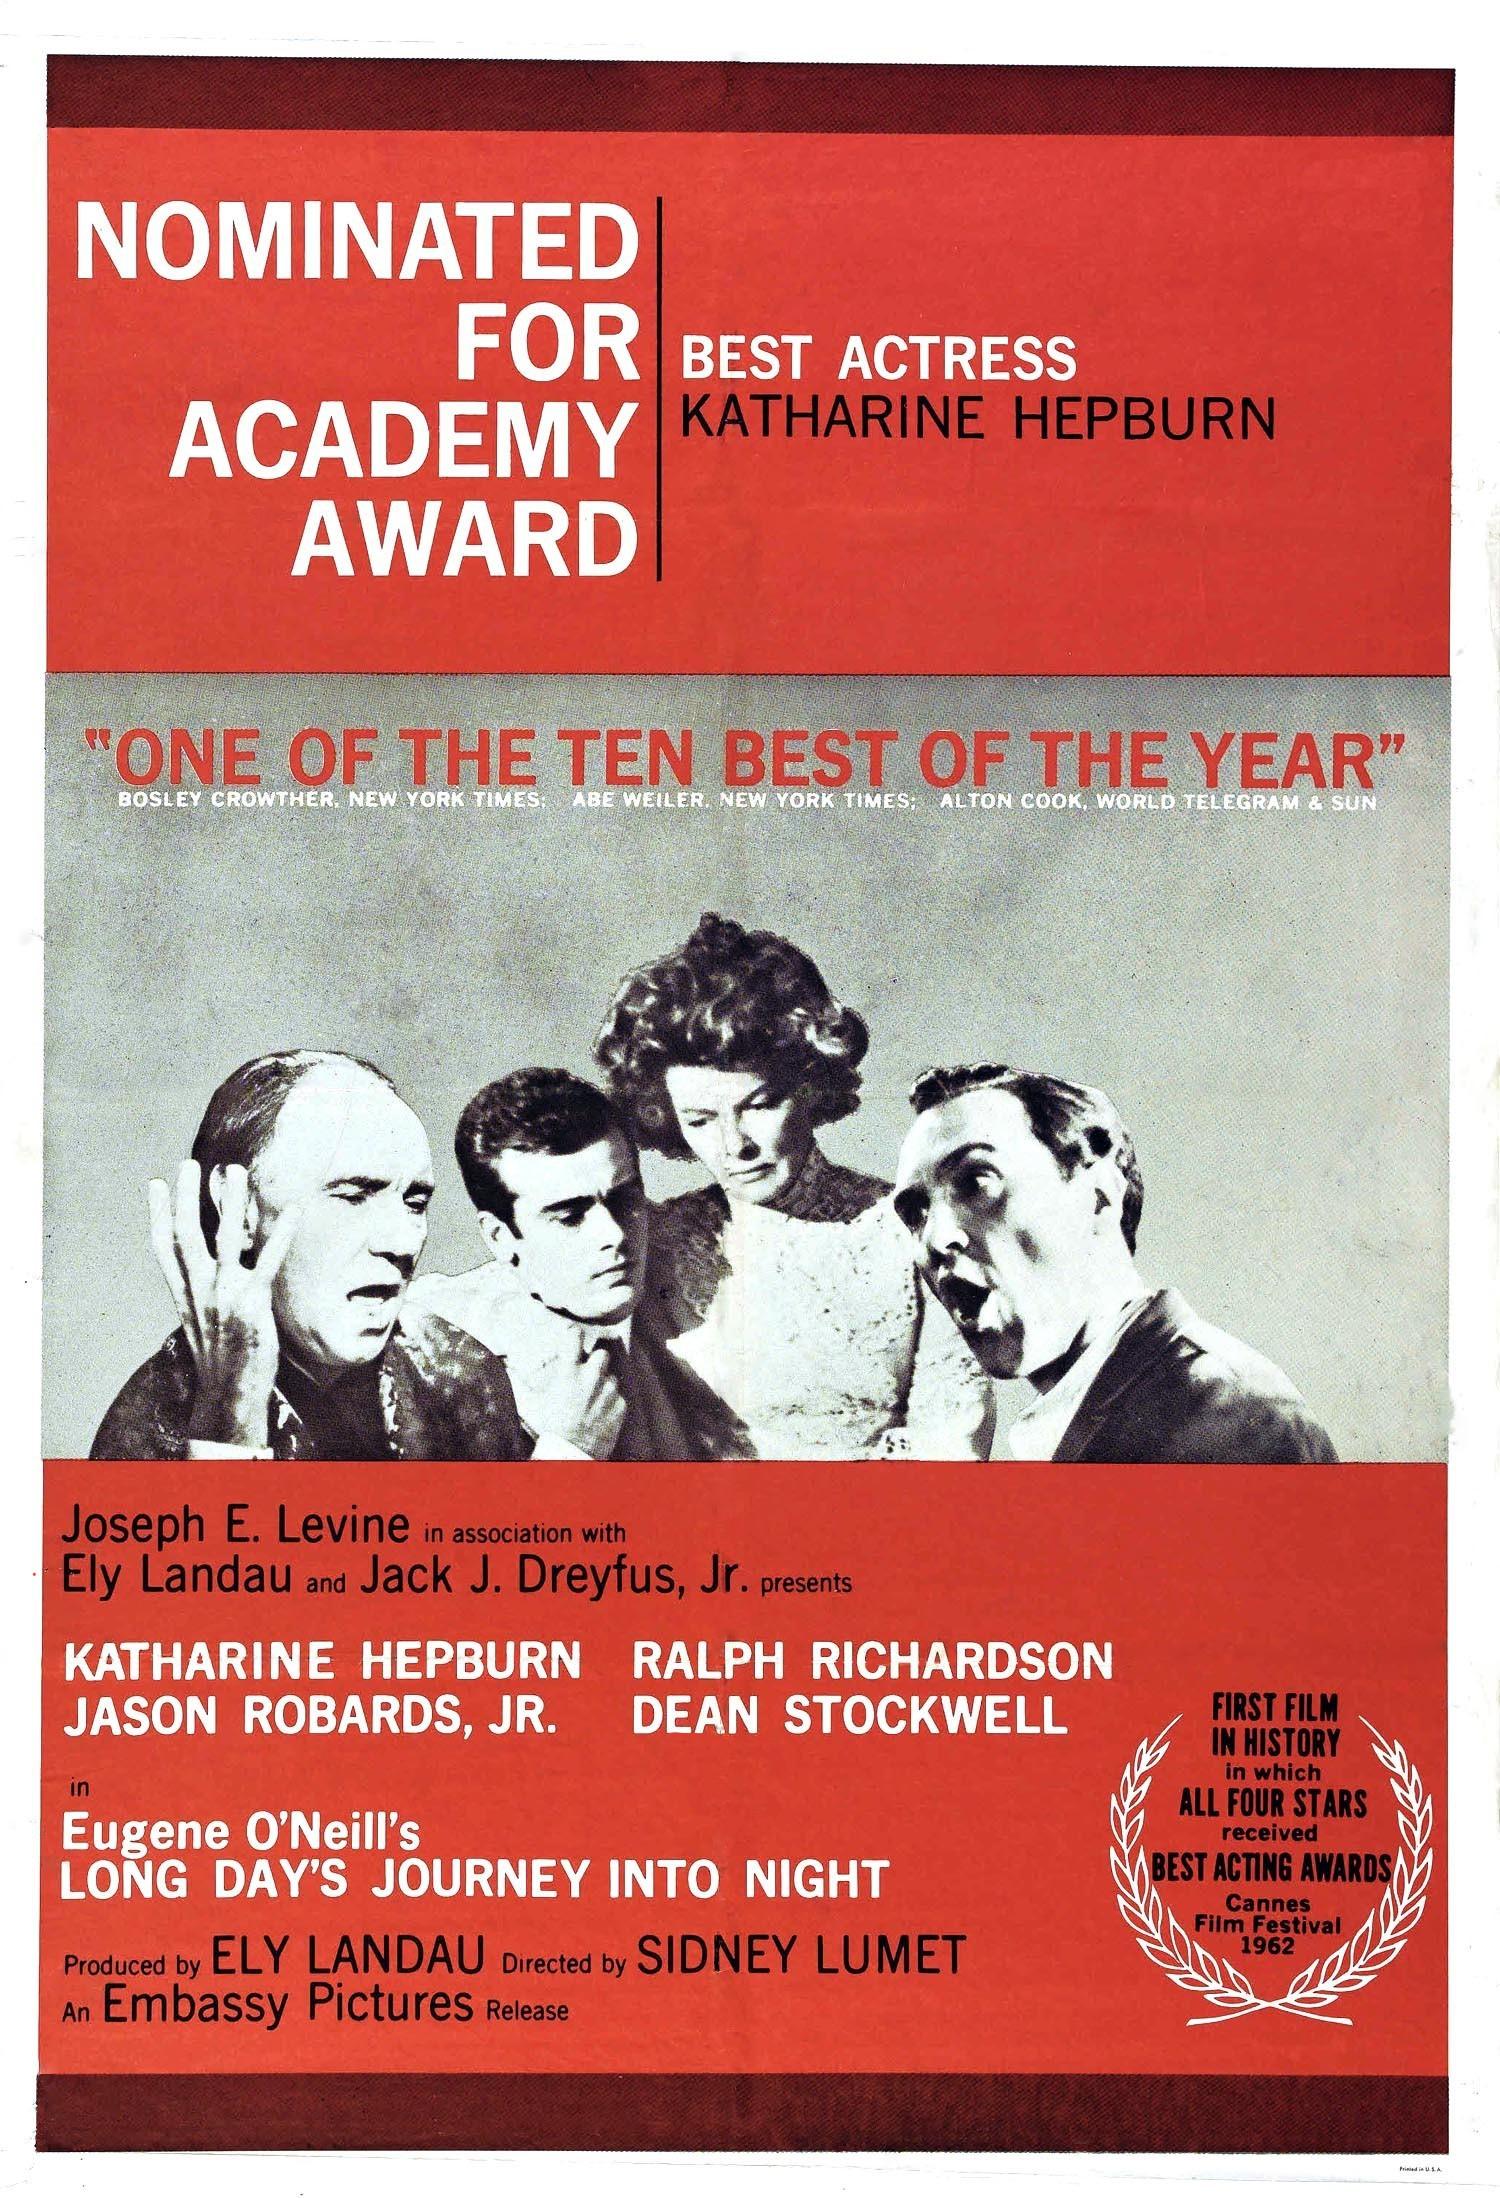 Eugene O'Neill's Long Day's Journey Into Night: Summary & Analysis